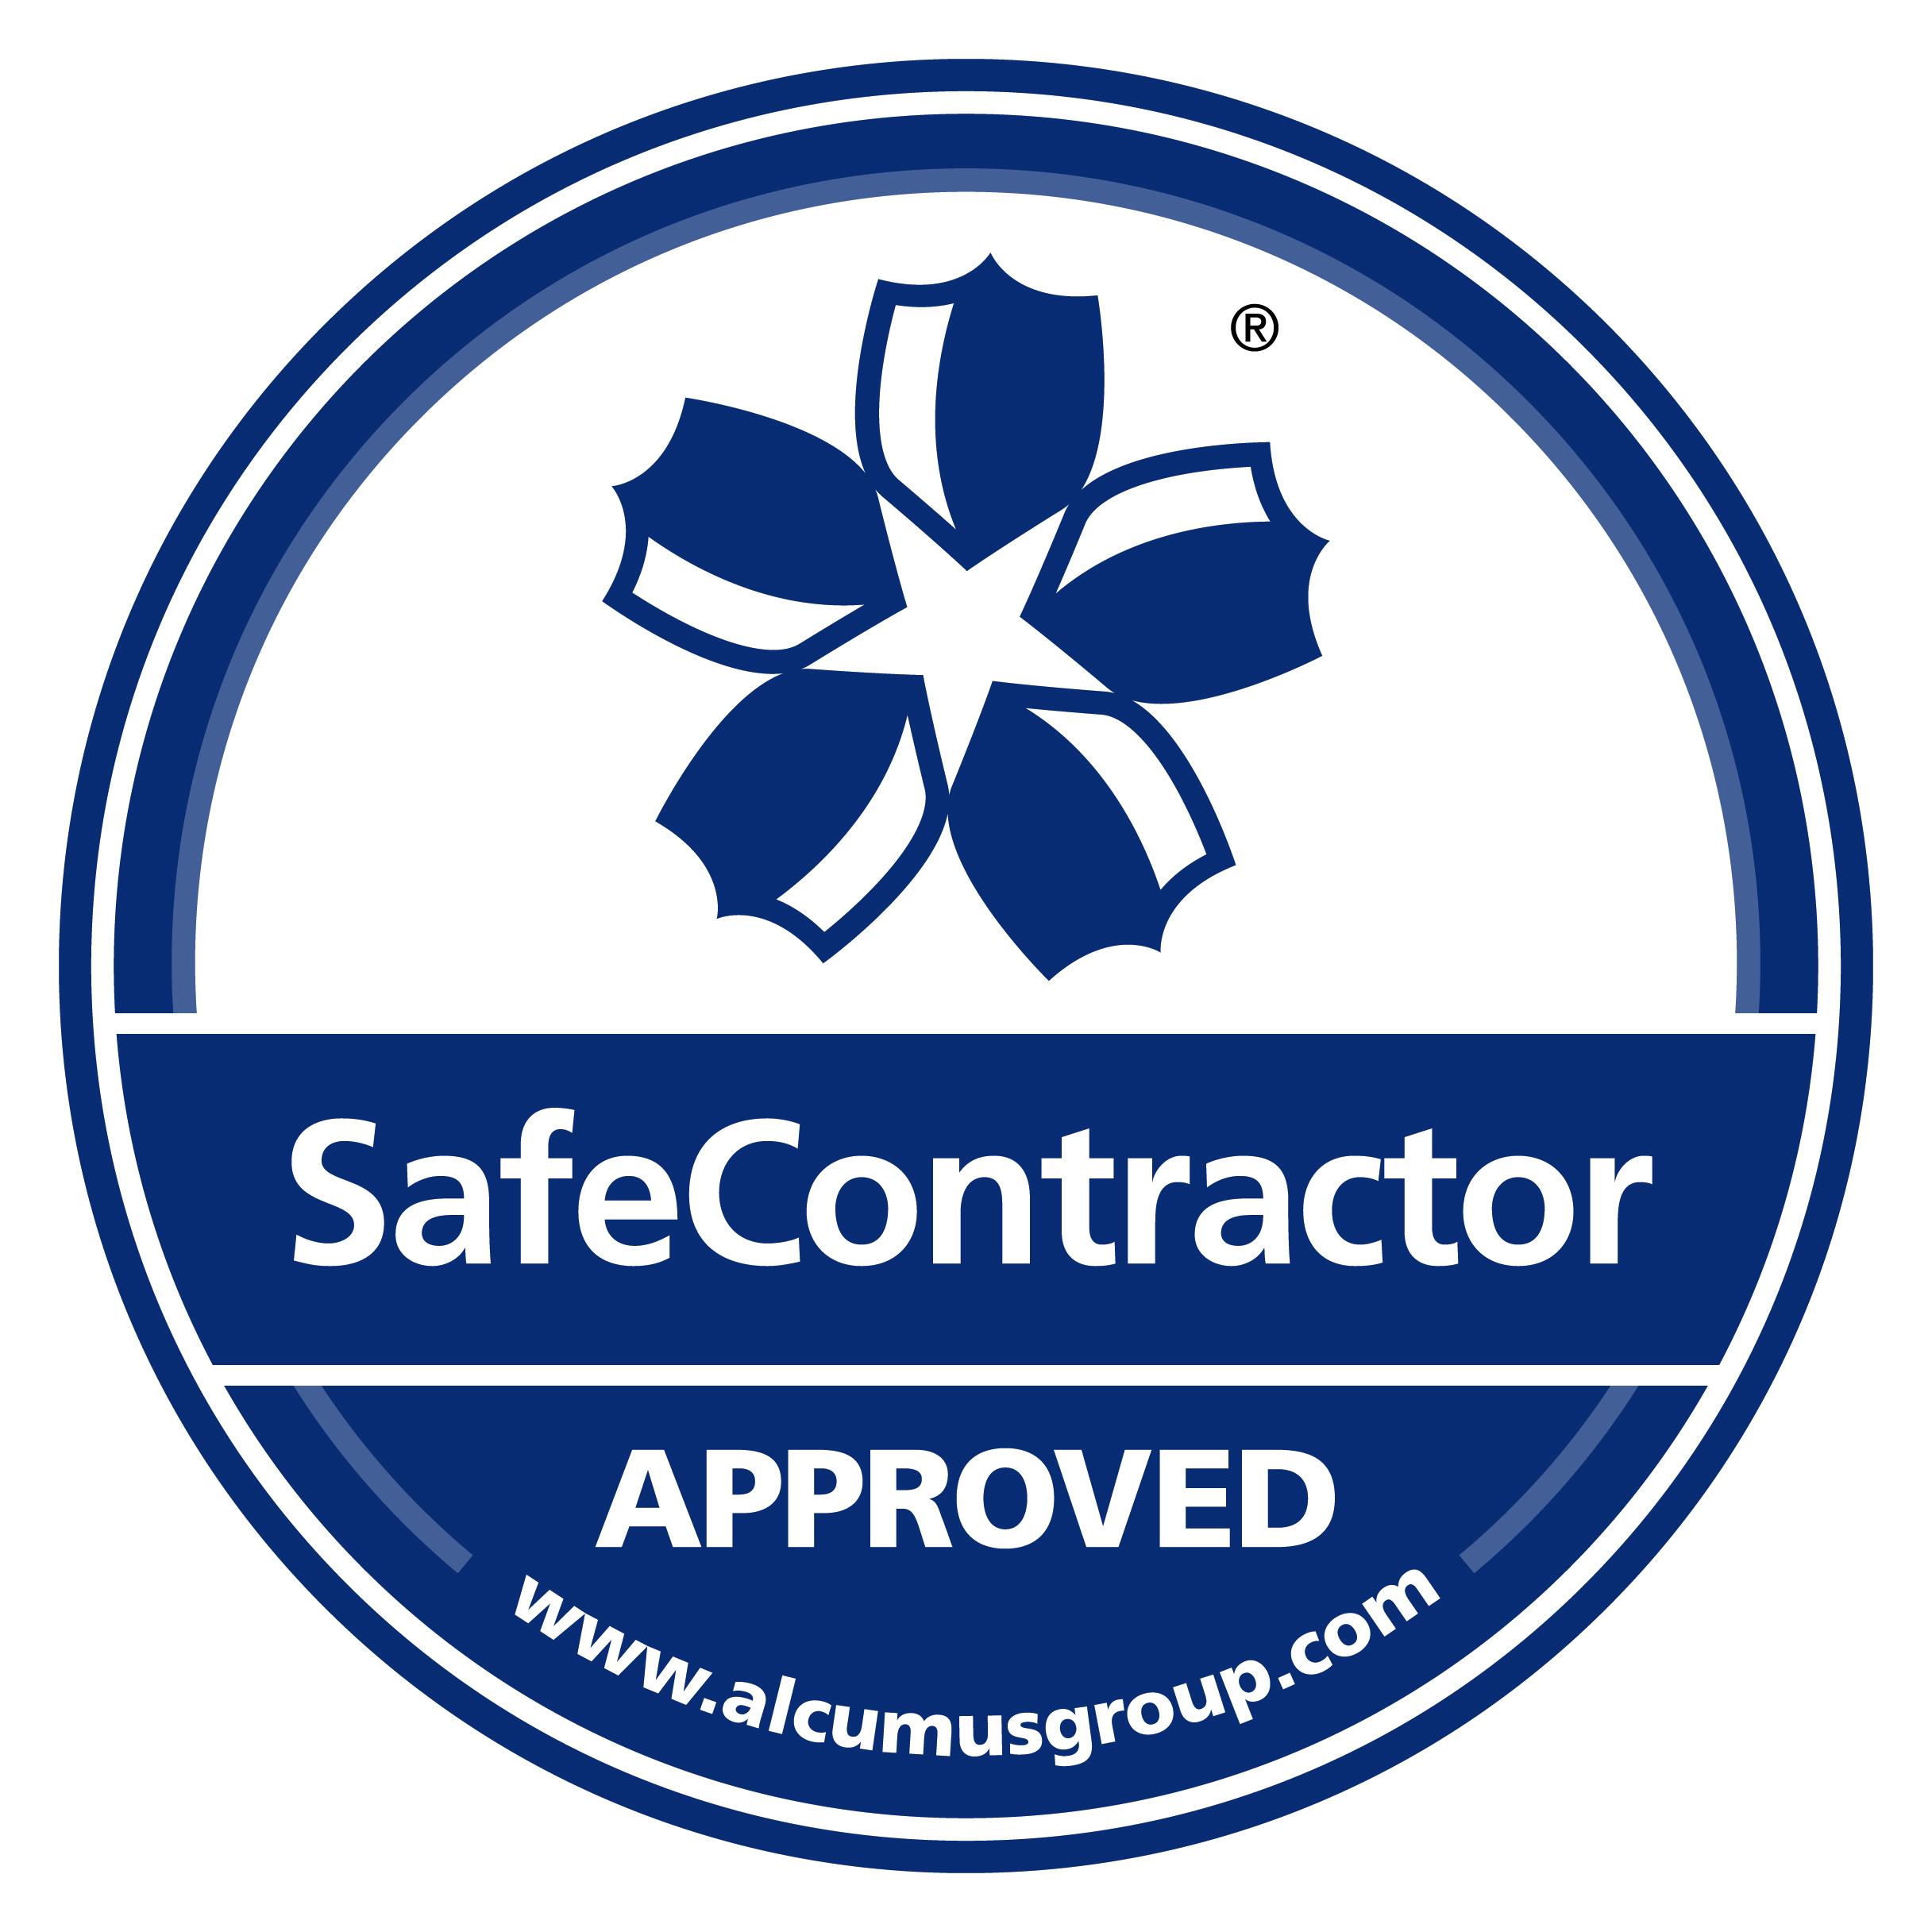 SafeContractor Status